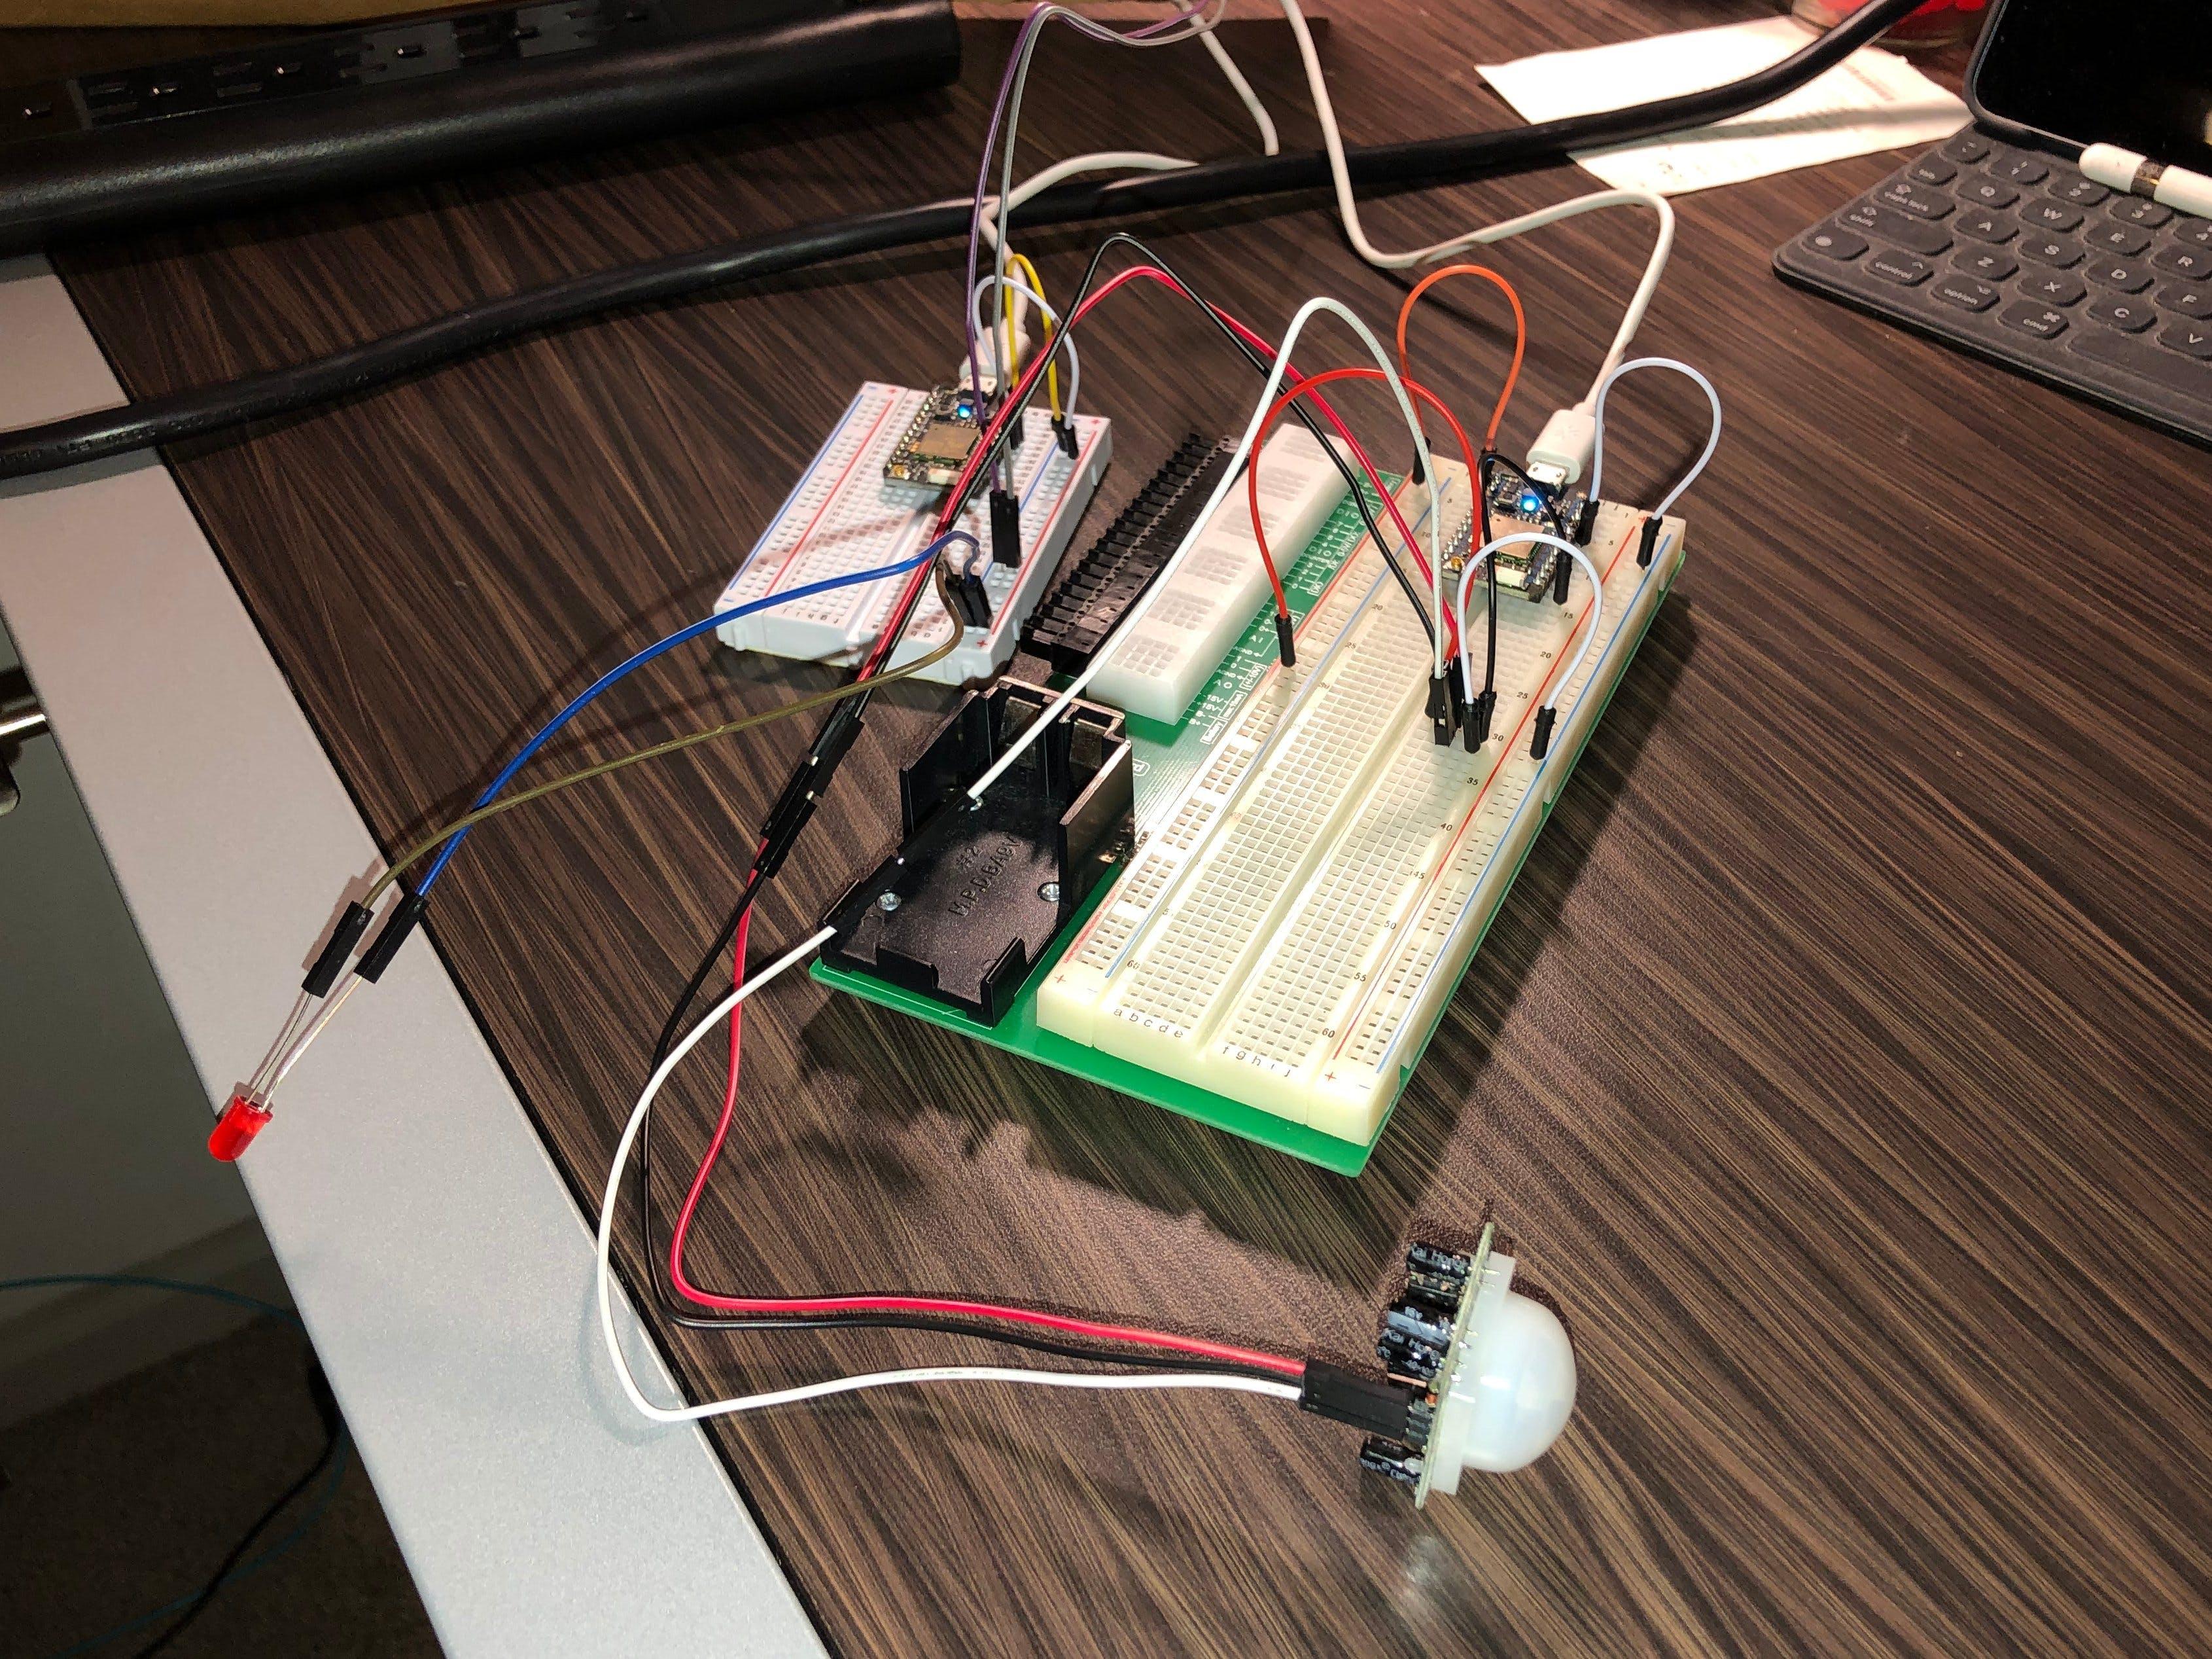 IoT Home Security Motion Sensor (Swansonator)